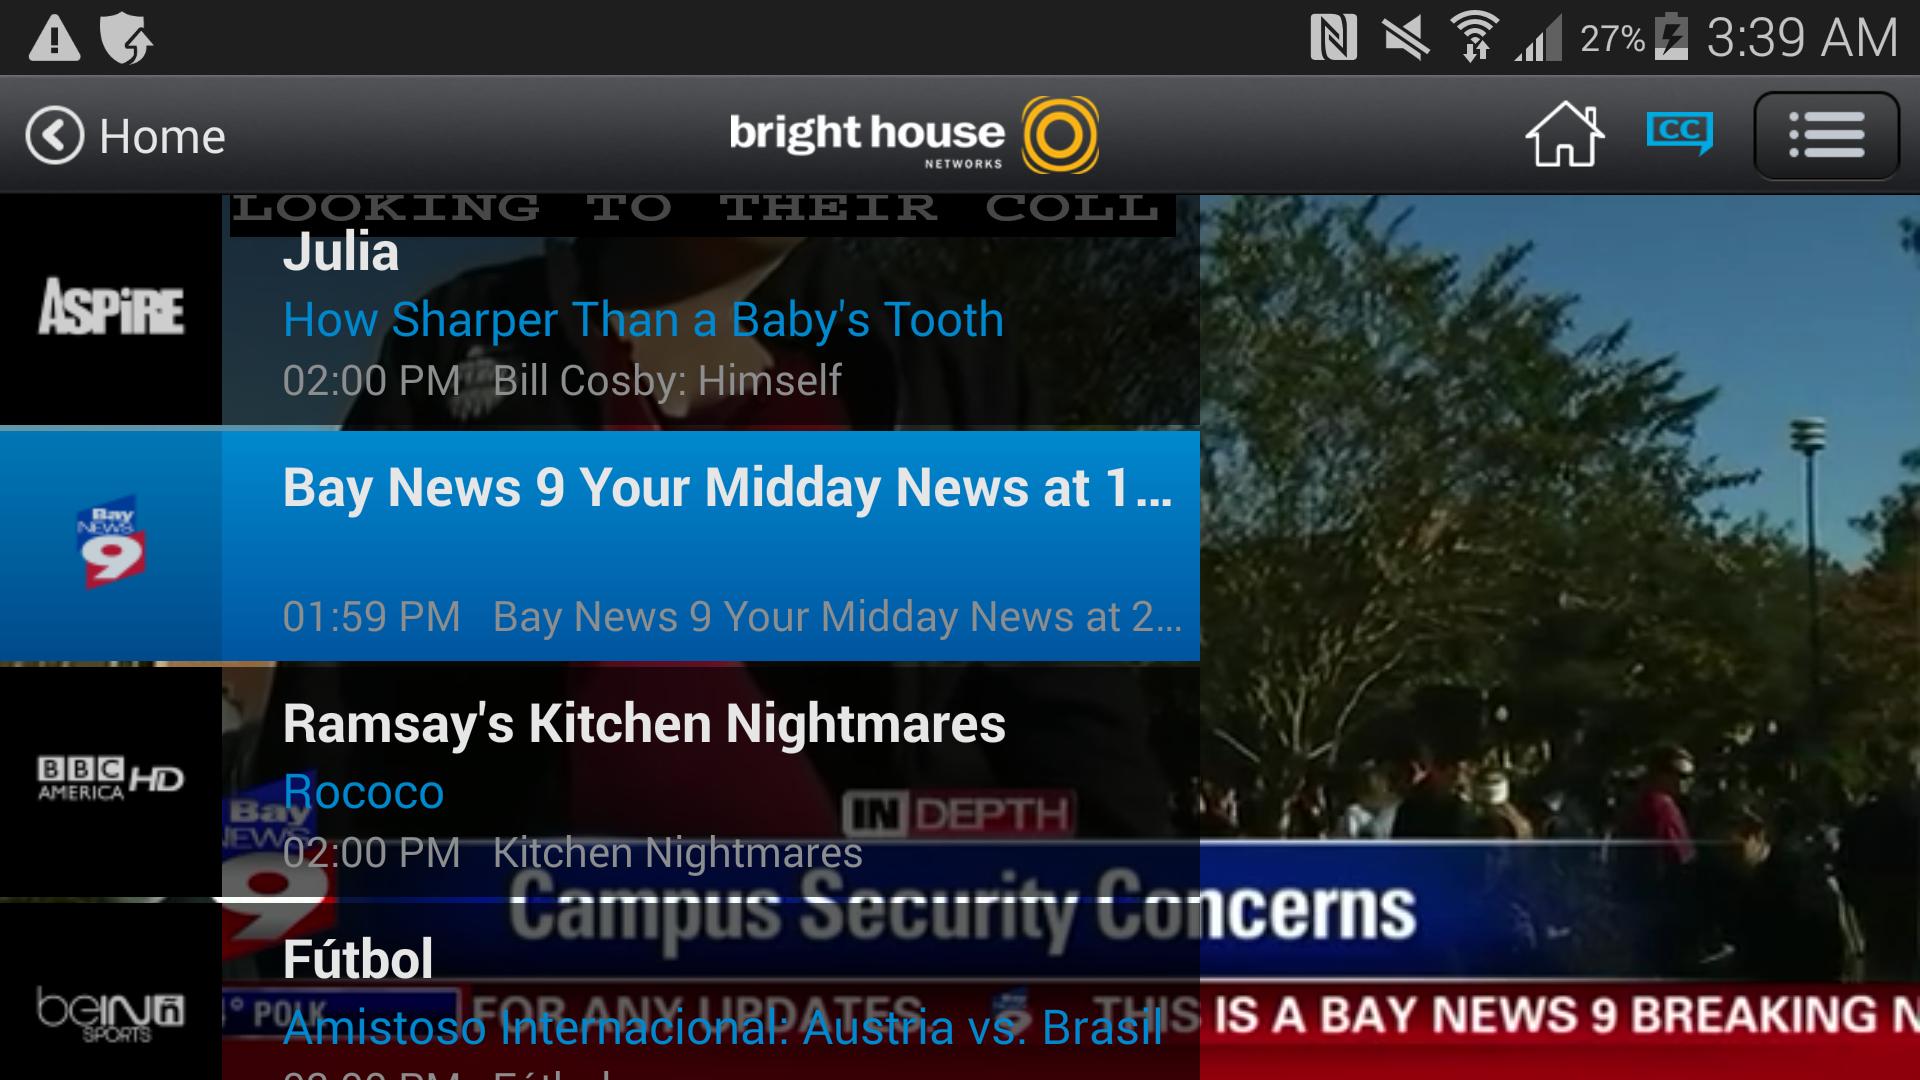 bright house tv - revenue & download estimates - google play store - us